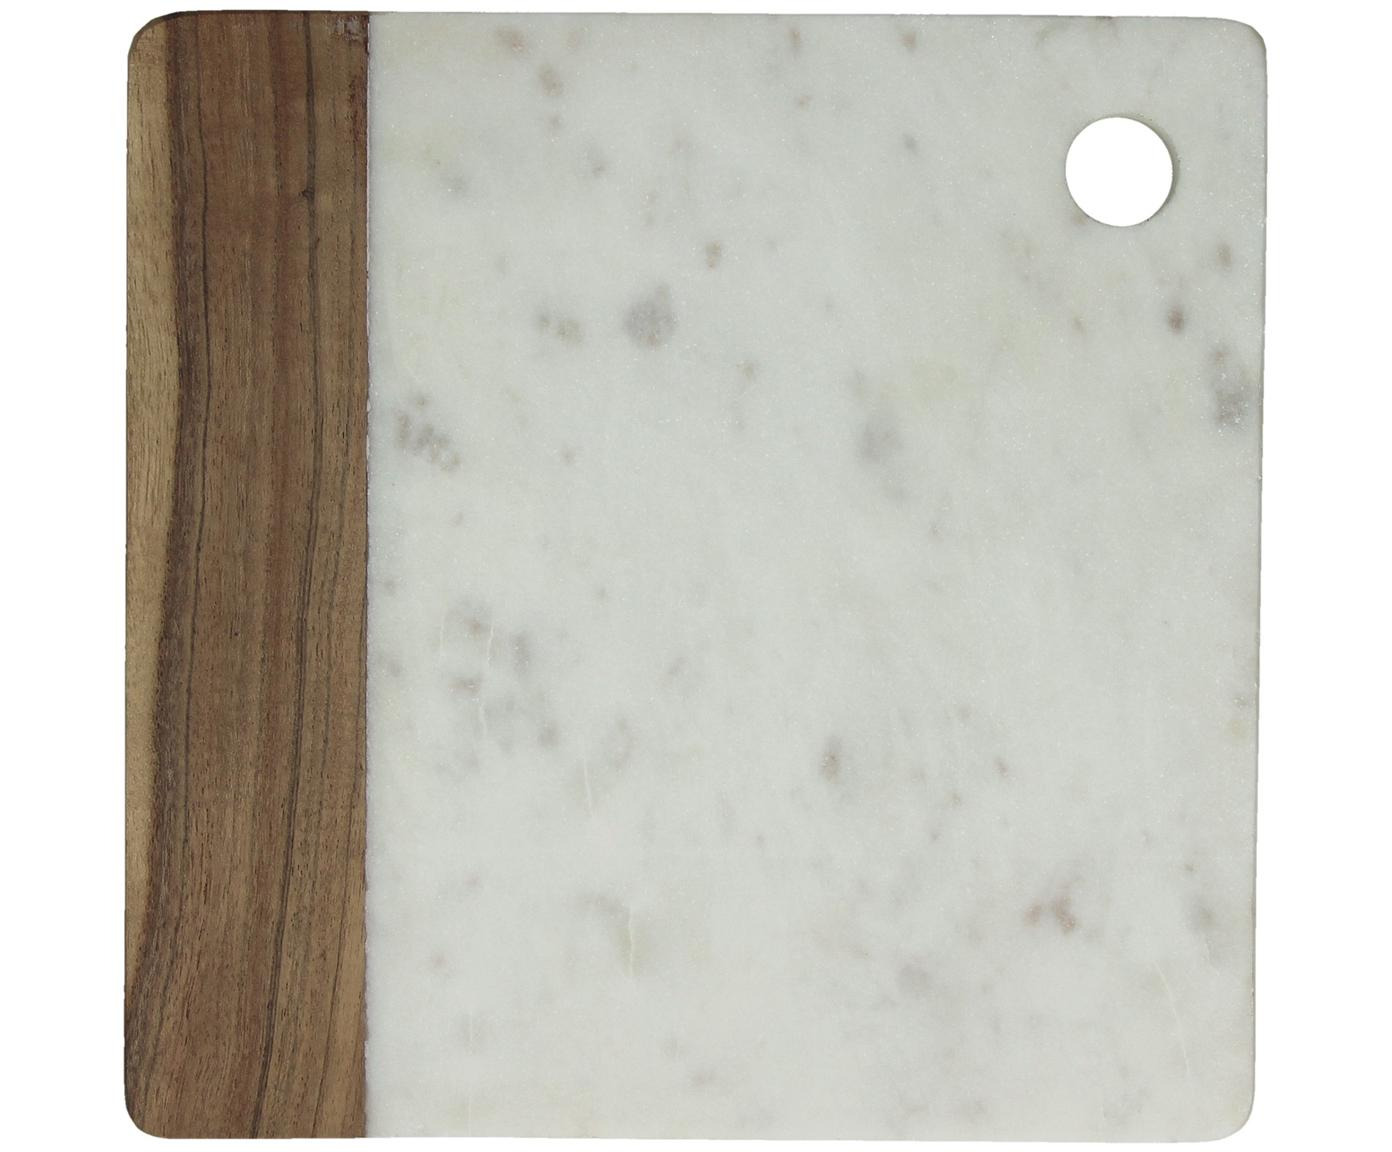 Marmeren snijplank Idli, Marmer, acaciahout, Wit gemarmerd, acaciakleurig, B 25 x D 25 cm